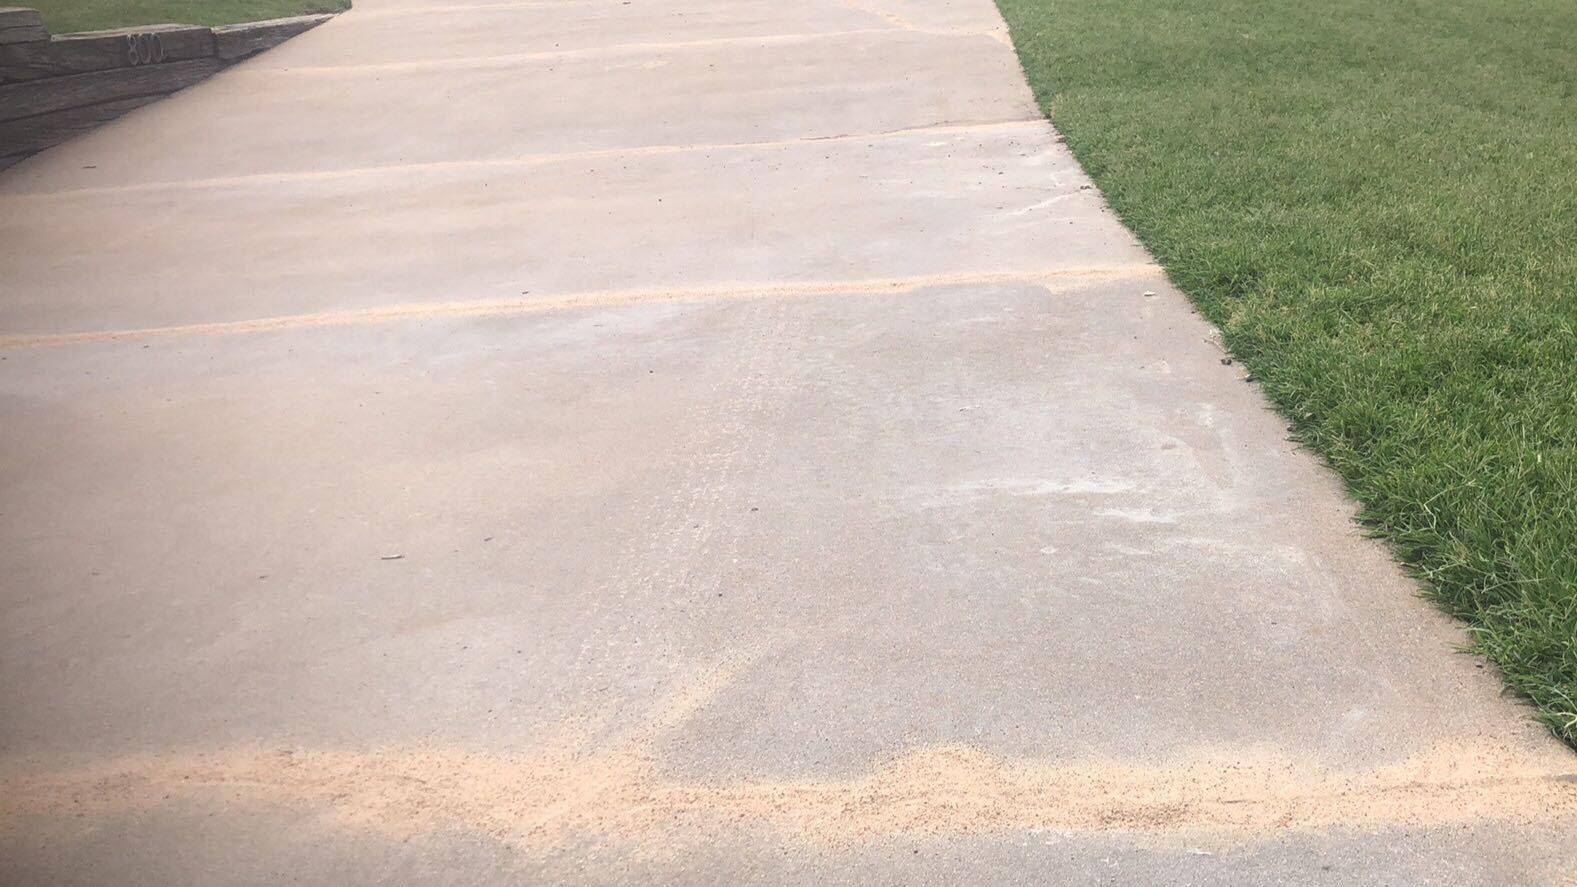 Polylevel for Sidewalk Repair in Alva, Ok - After Photo